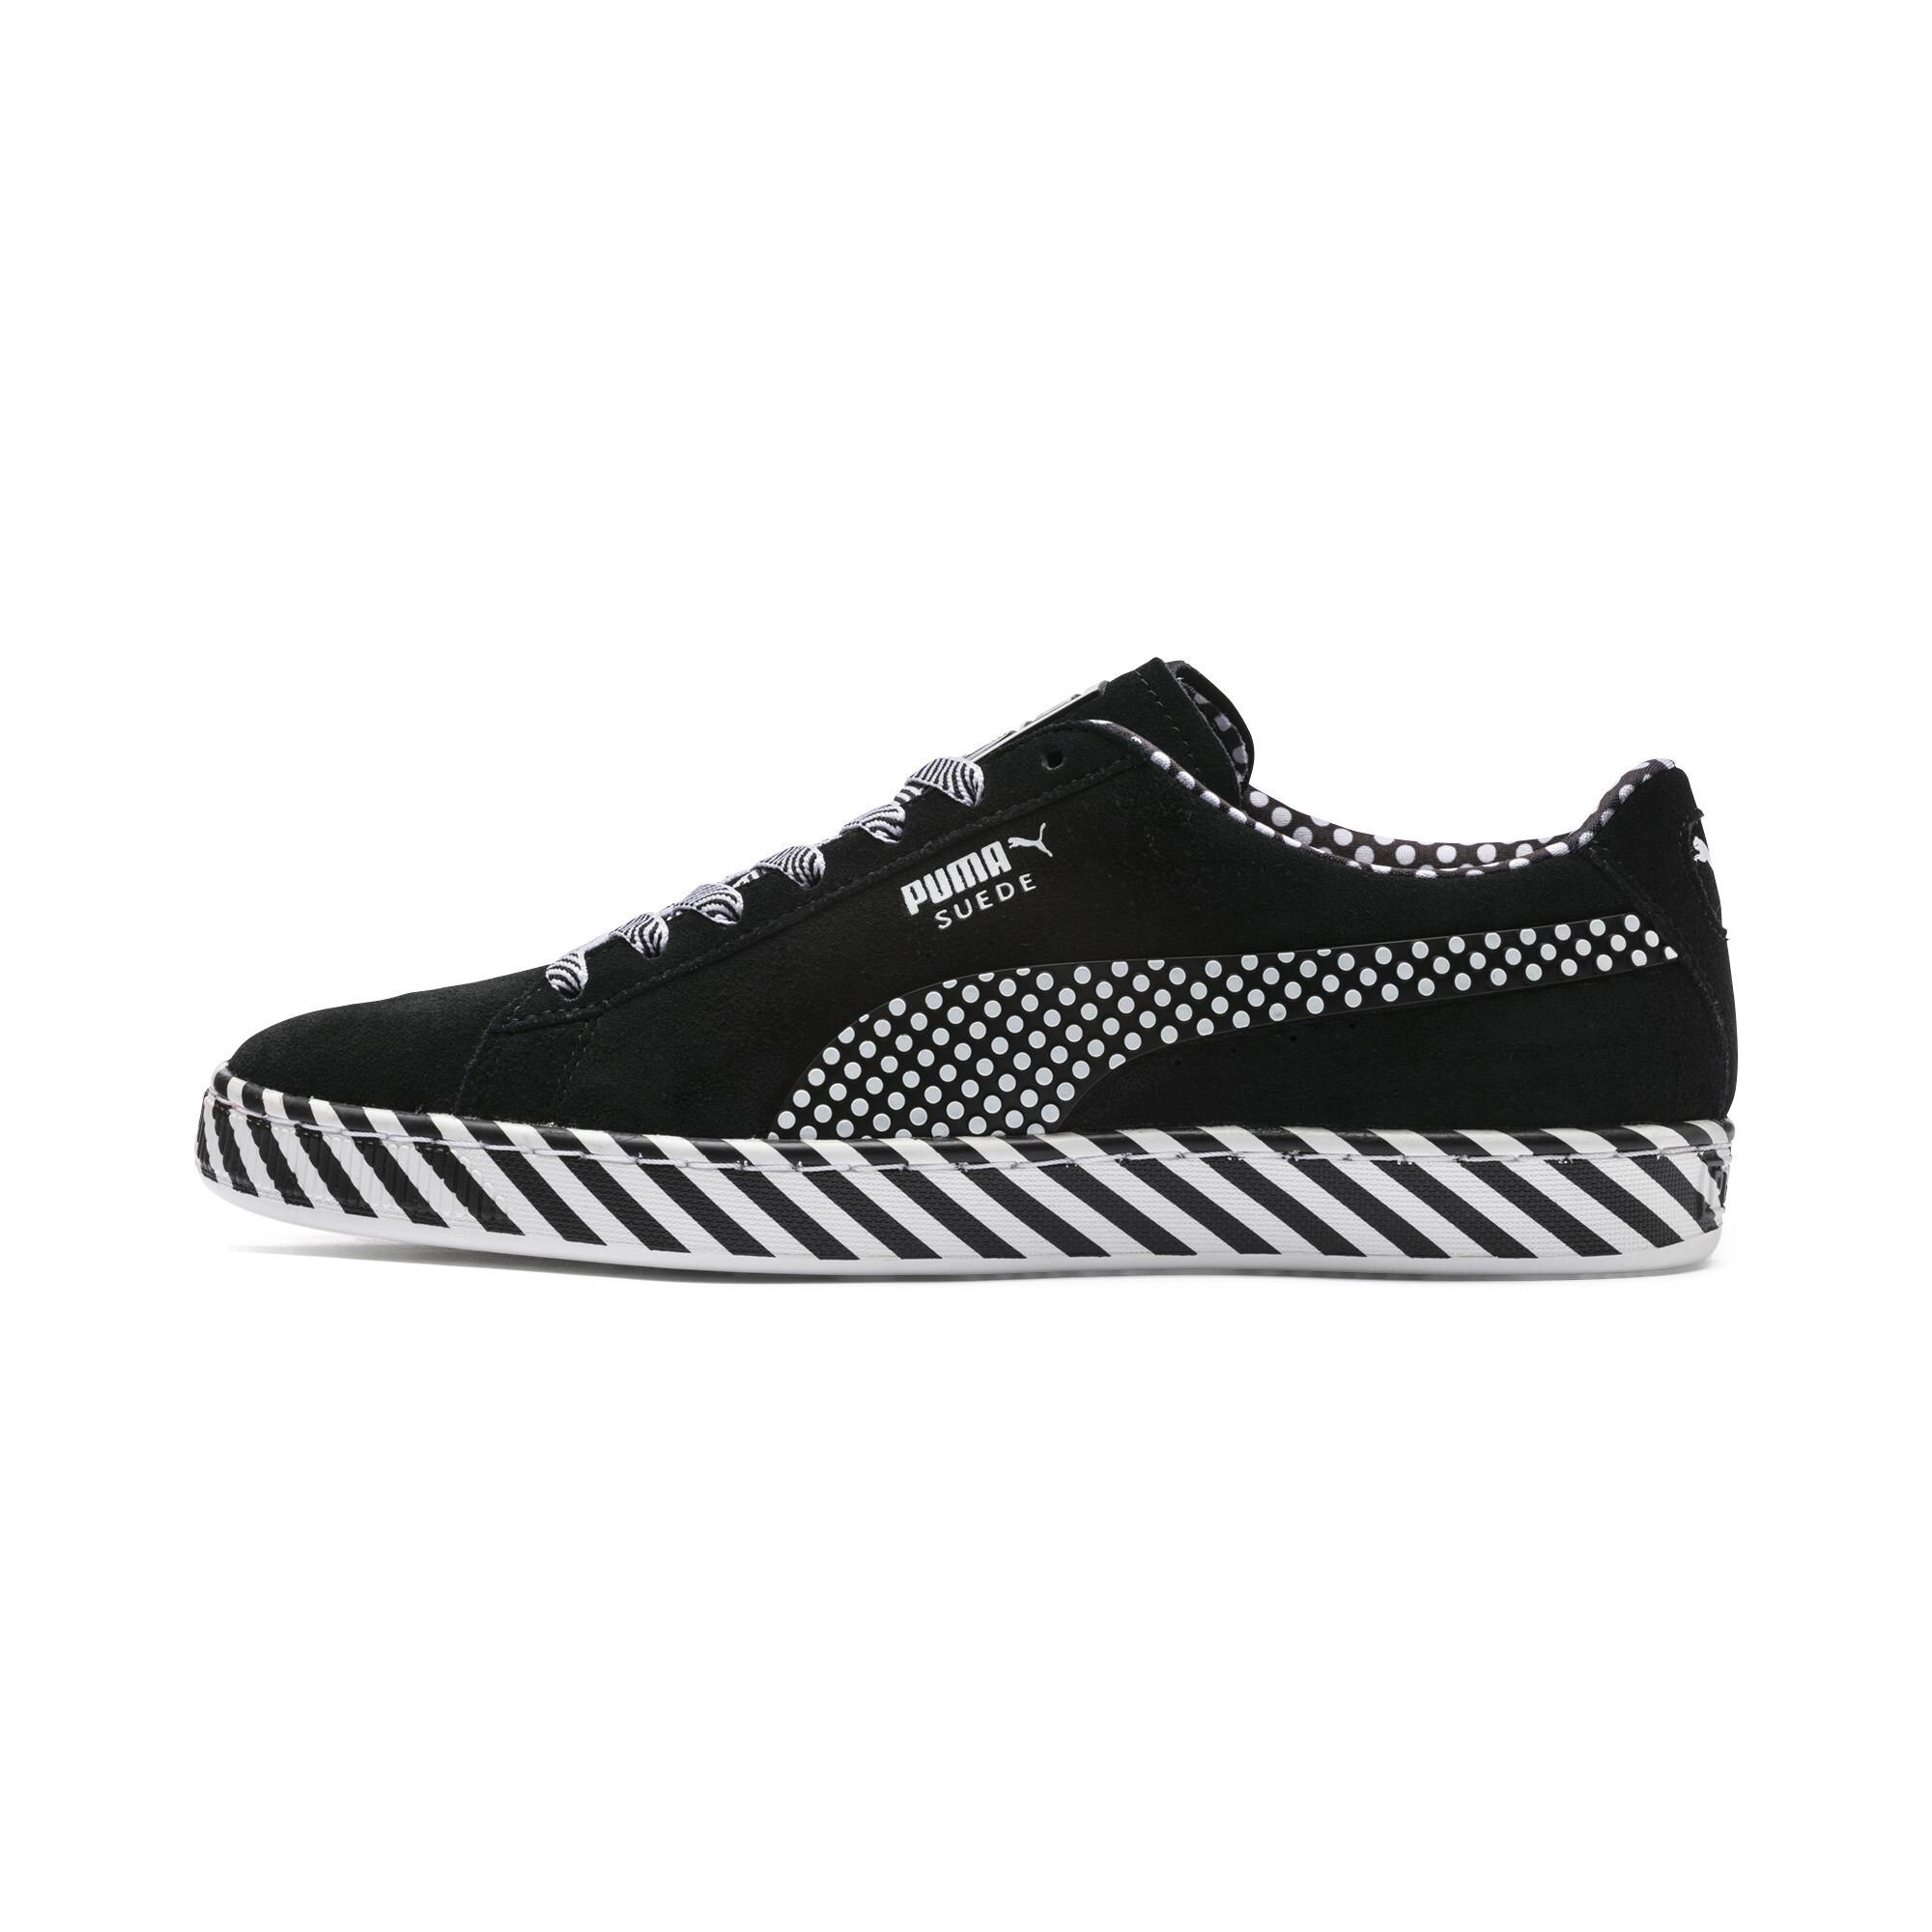 Image Puma Suede Classic Pop Culture Sneakers #1